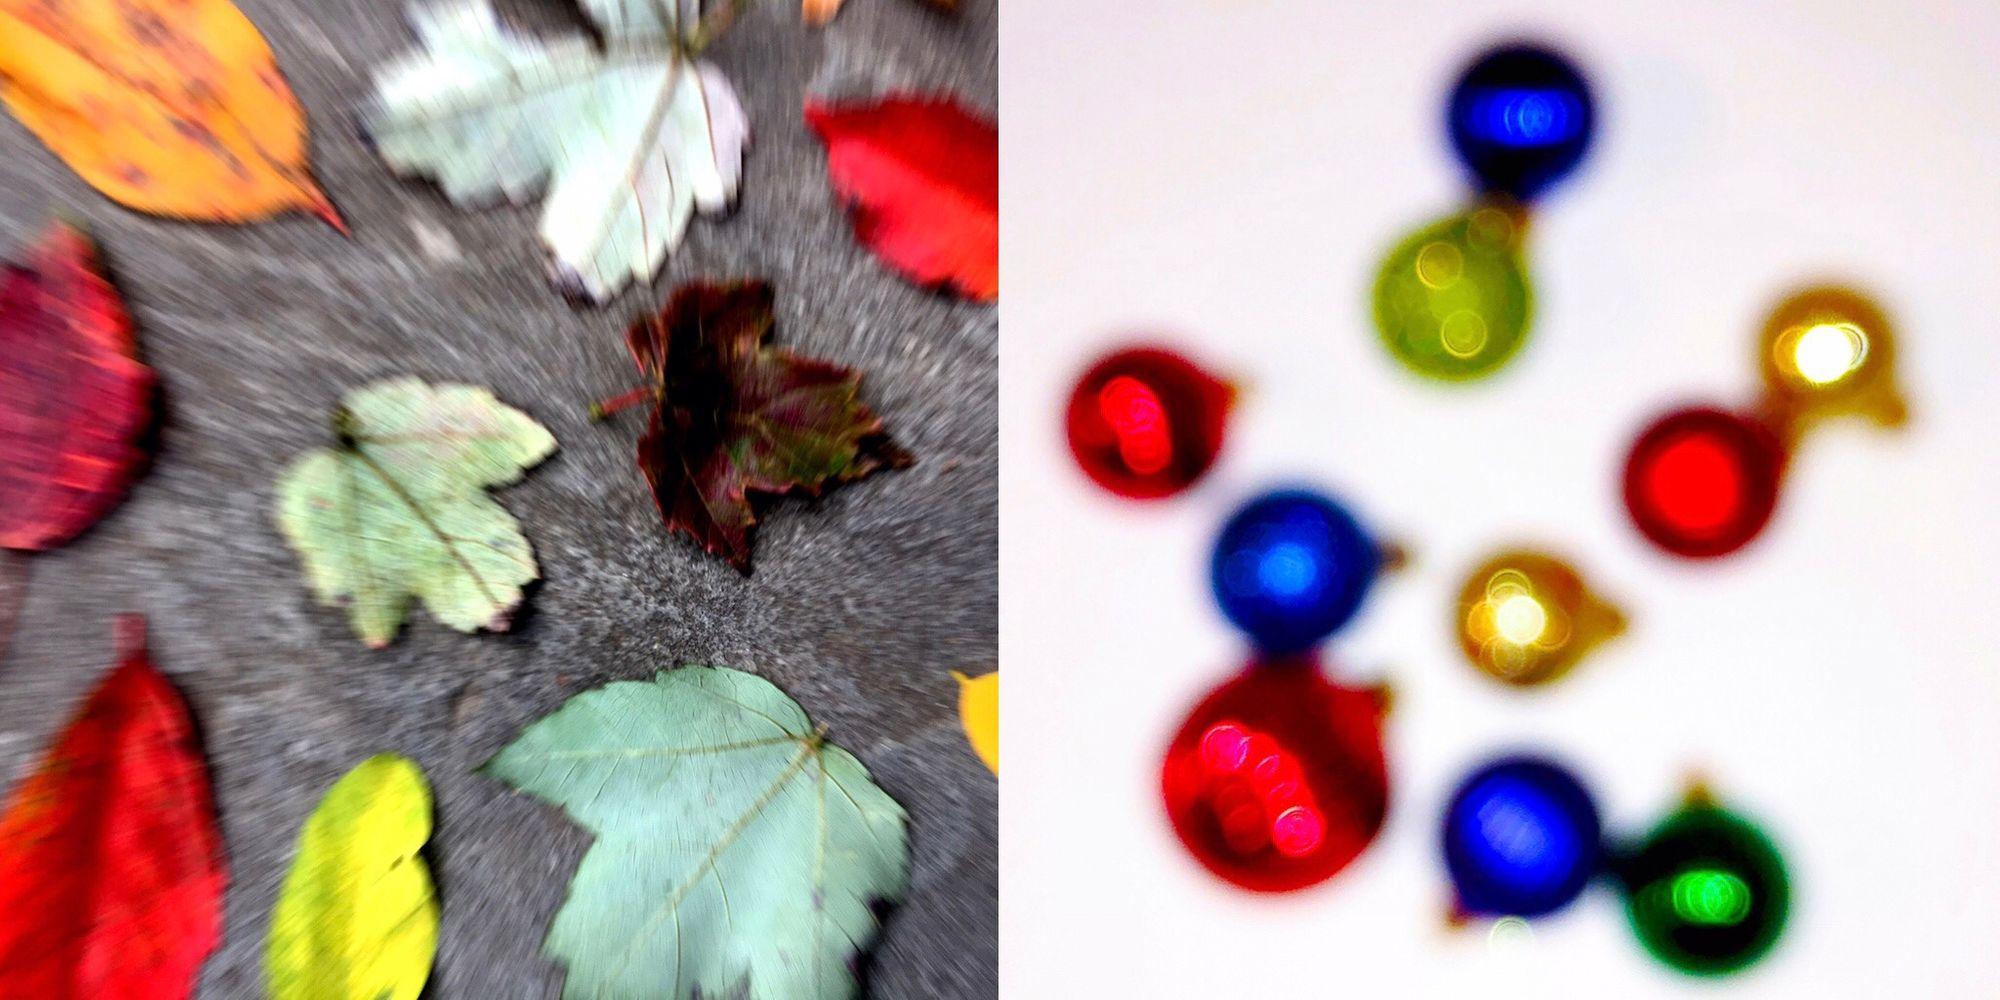 xmas and leaves.jpg